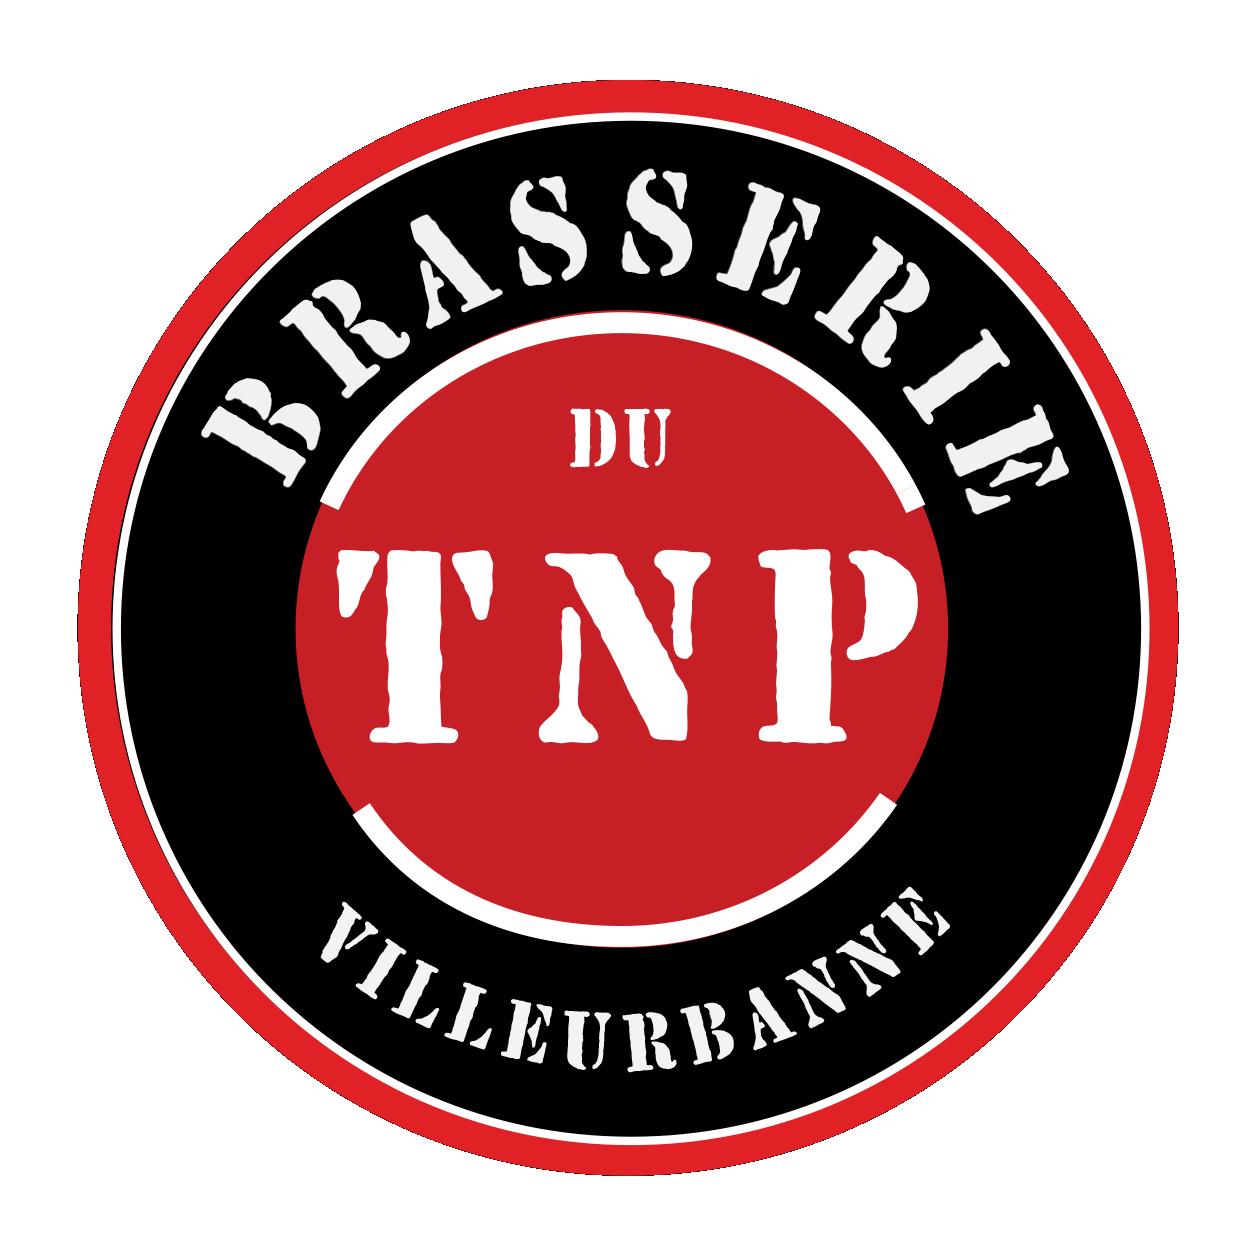 Brasserie du TNP